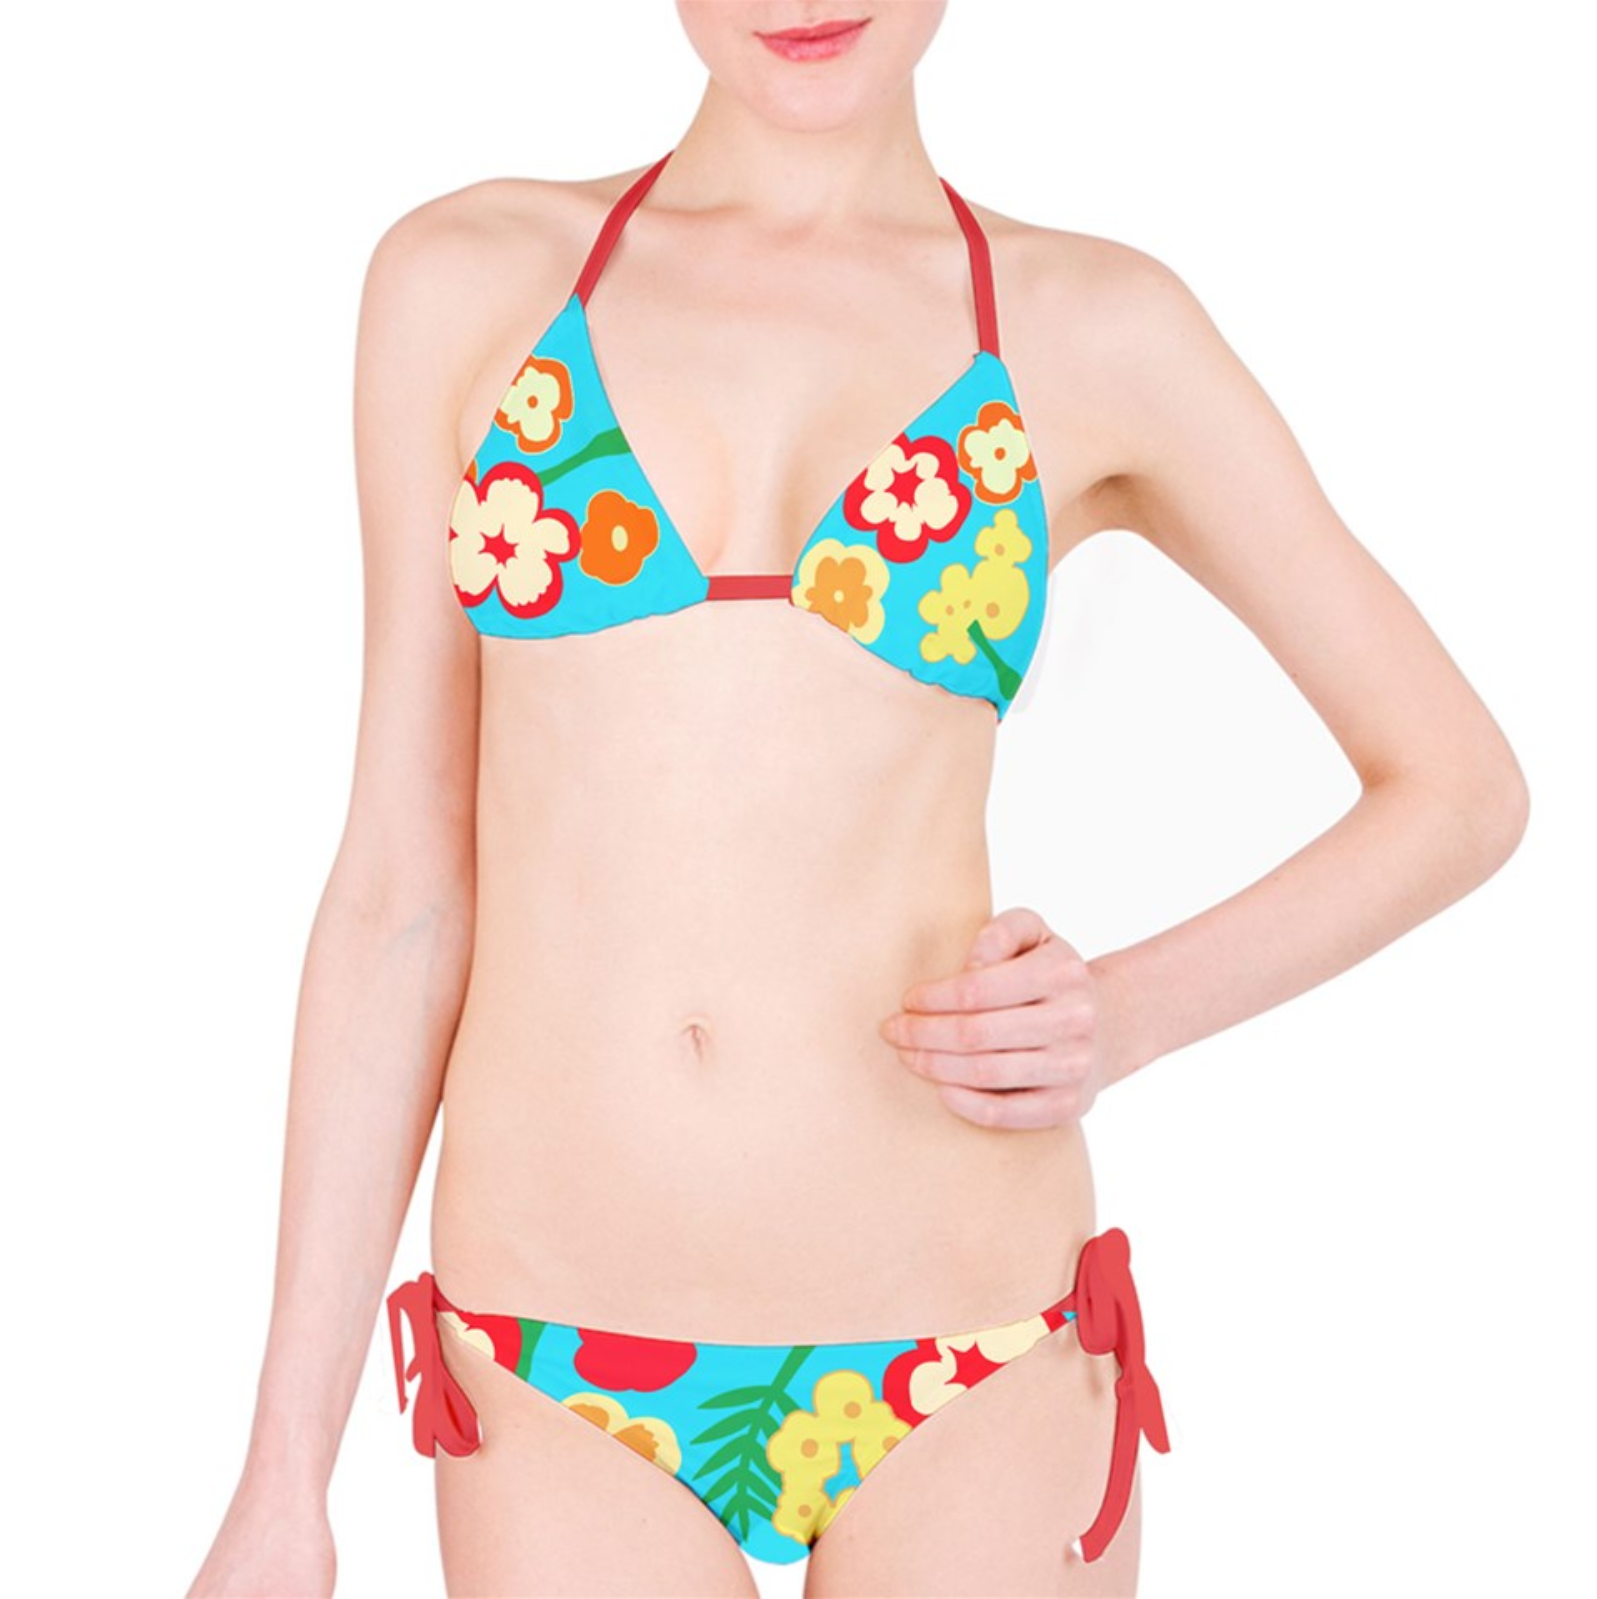 b9ede3f8e Ann Takamaki - Floral Print Bikini Set (Persona 5) on Storenvy